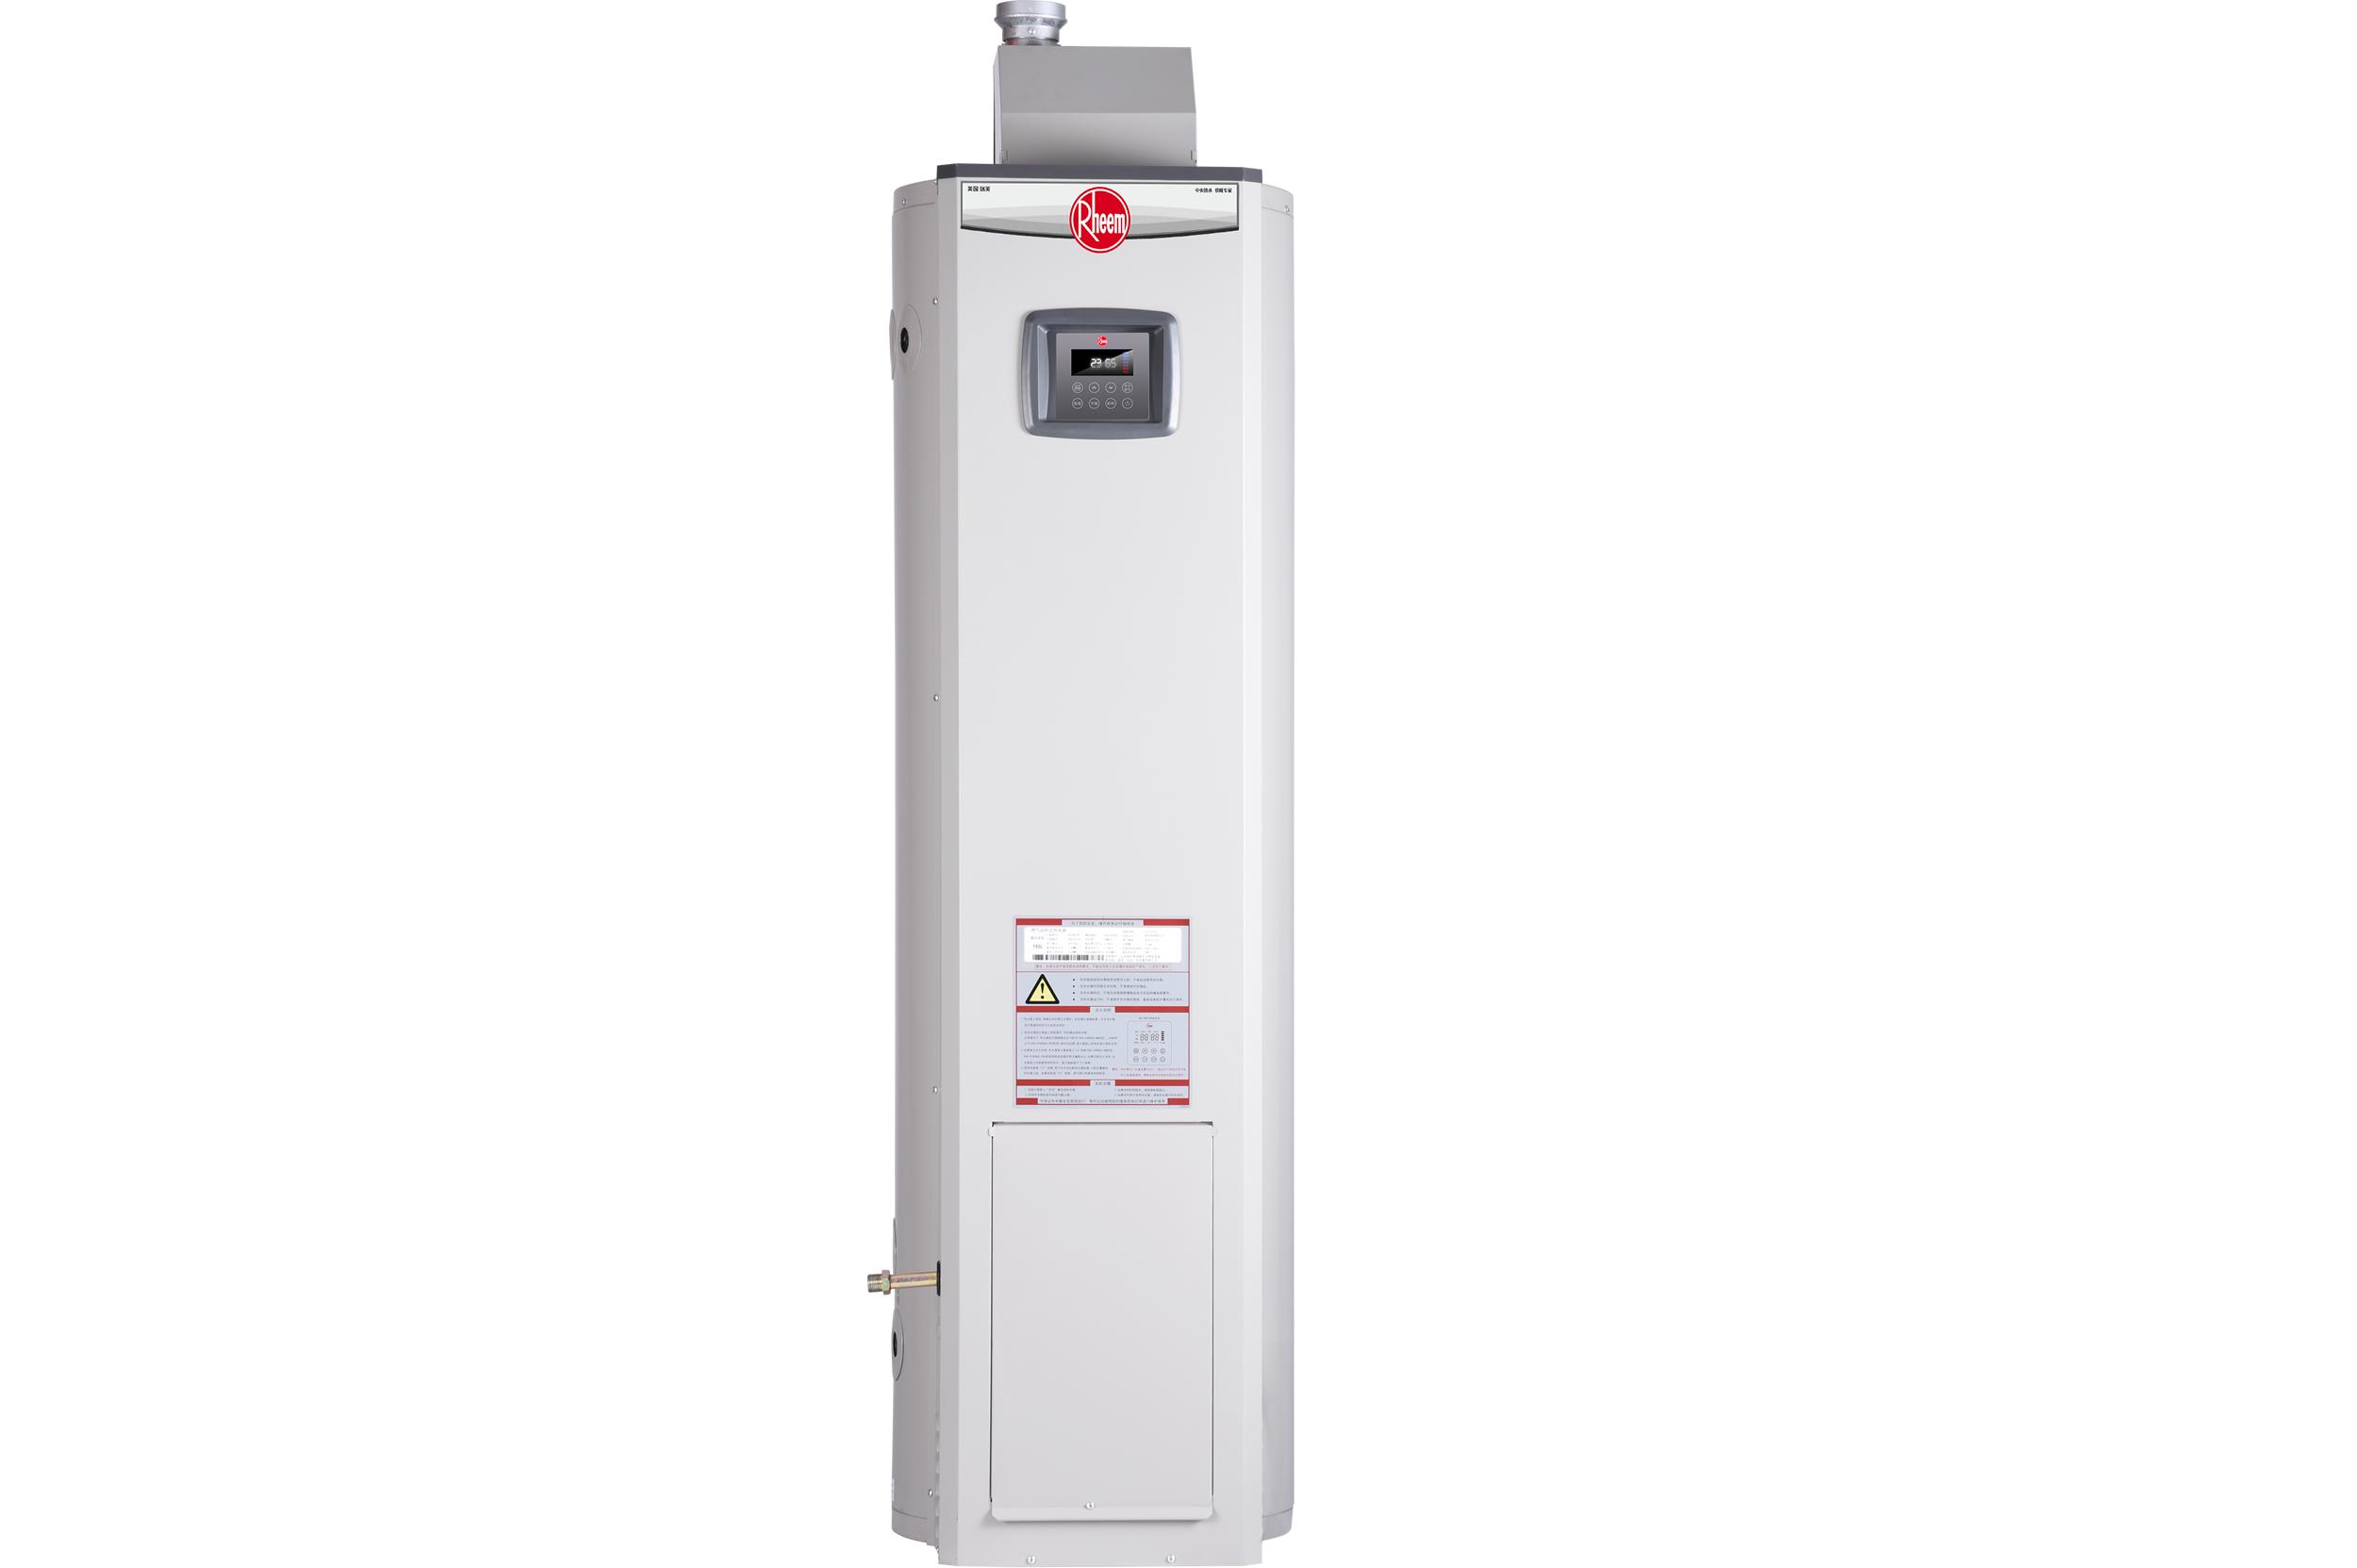 RGS-PV强排型容积式燃气热水器